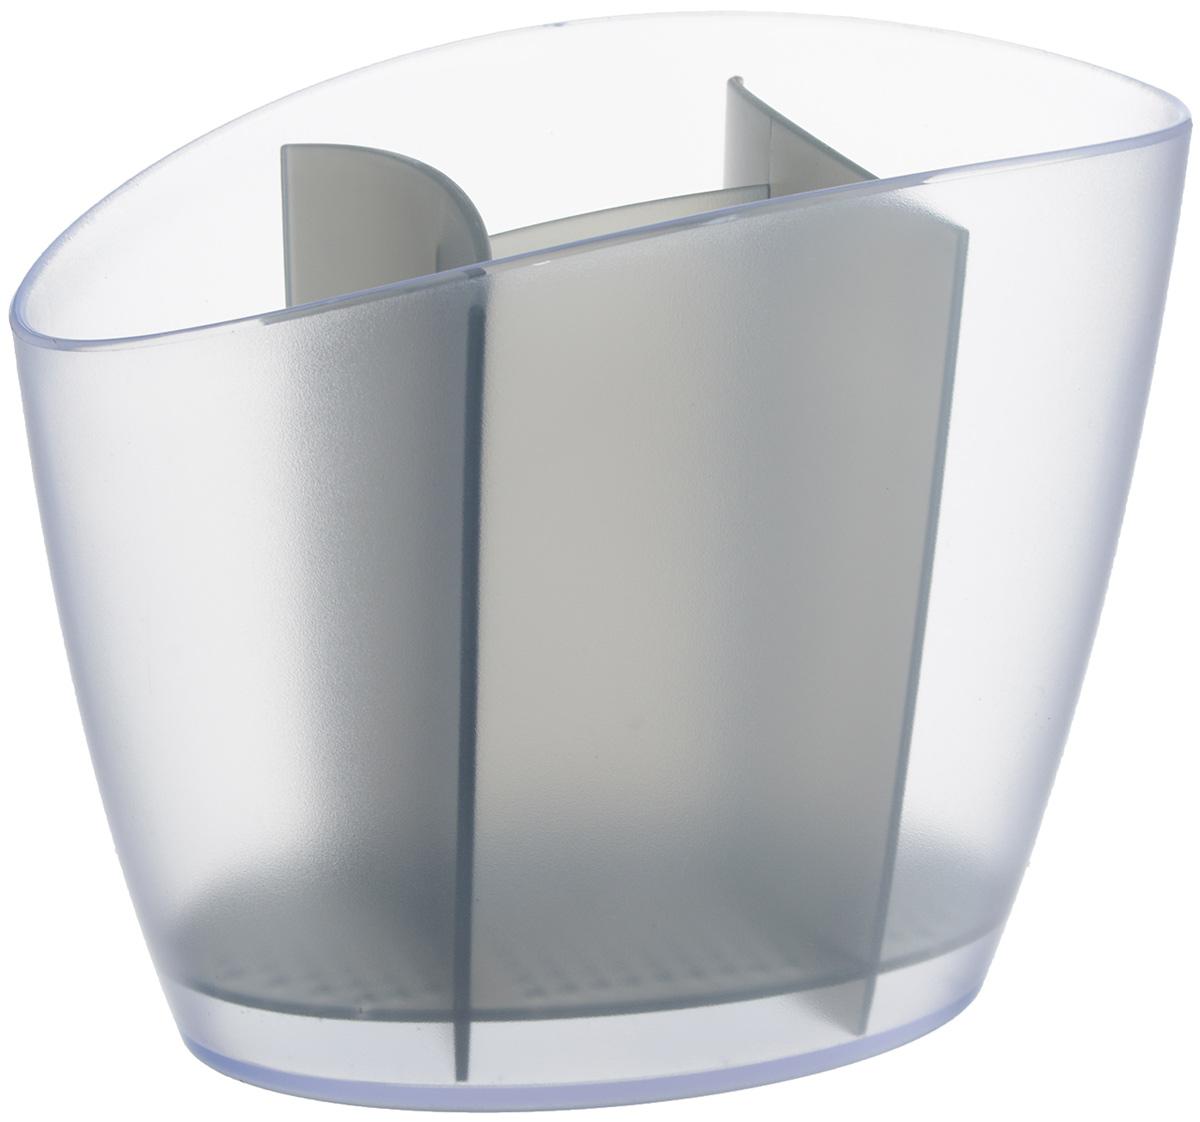 "Сушилка для столовых приборов Tescoma ""Clean Kit"", цвет: серый, 19,5 х 11 х 15,5 см"